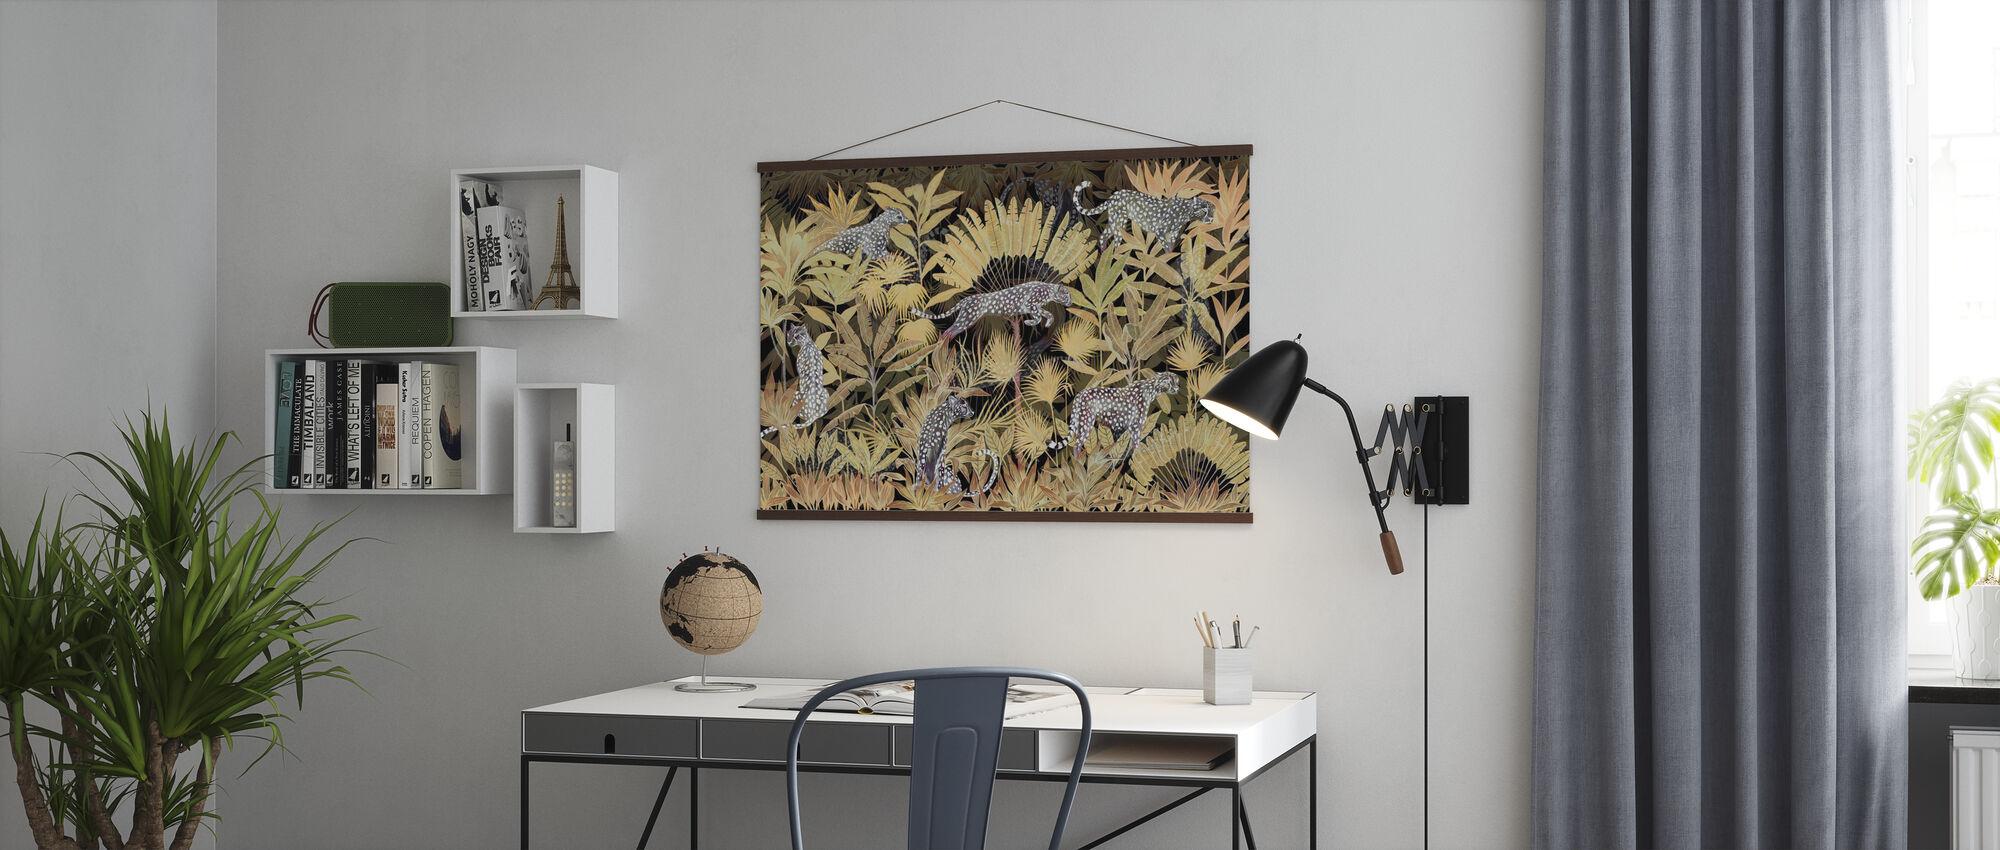 Lurking Cheetahs - Midnight - Poster - Office